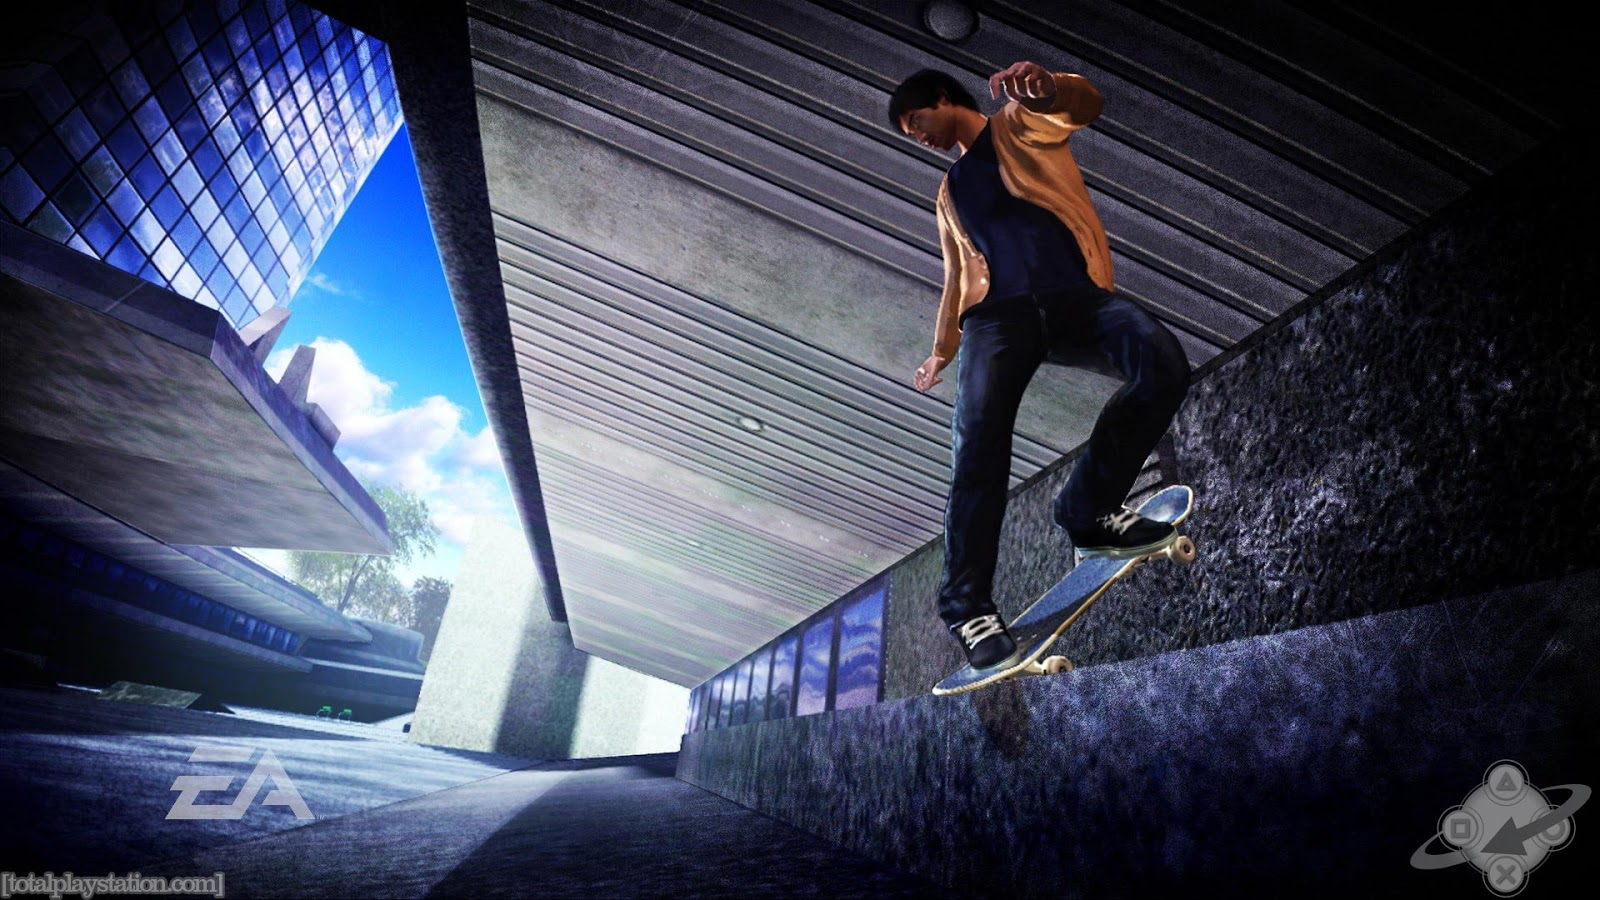 wallpapers hd for mac Skateboarding Wallpaper HD 1600x900